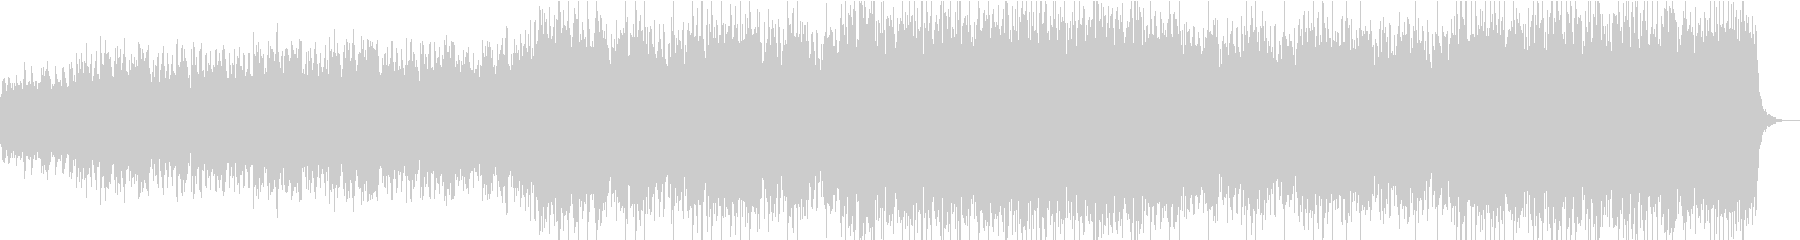 Mixed chorus / space / disco / minor melody's unreproduced waveform